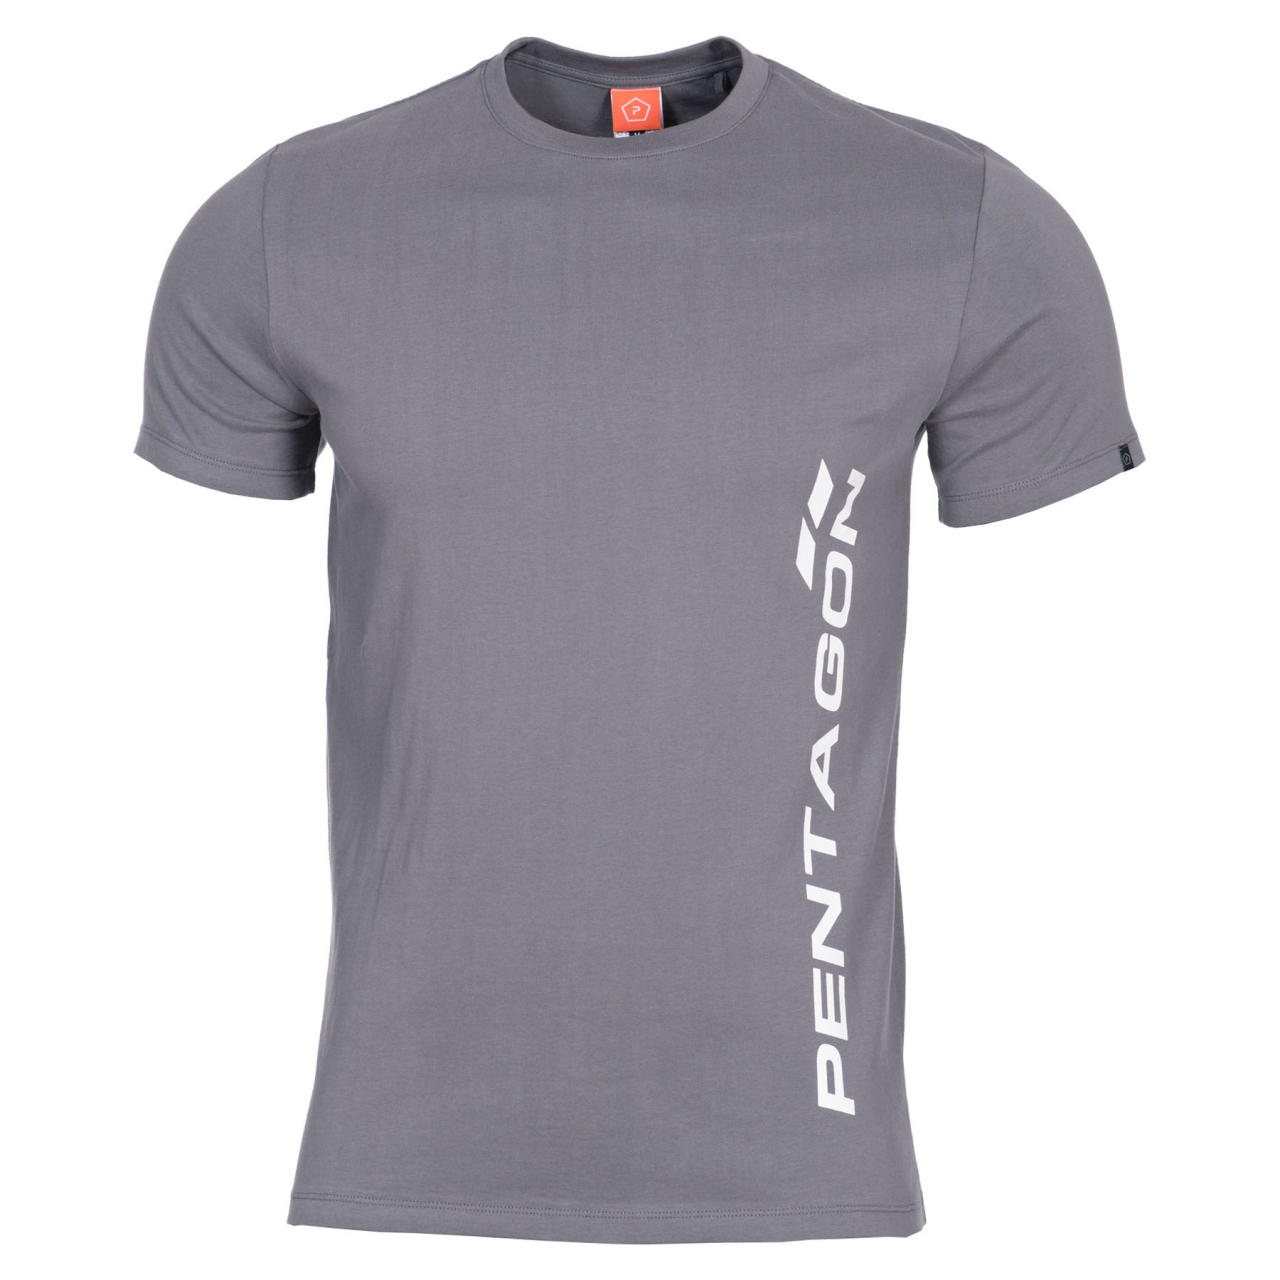 Tričko Pentagon Vertical - šedé, XXL